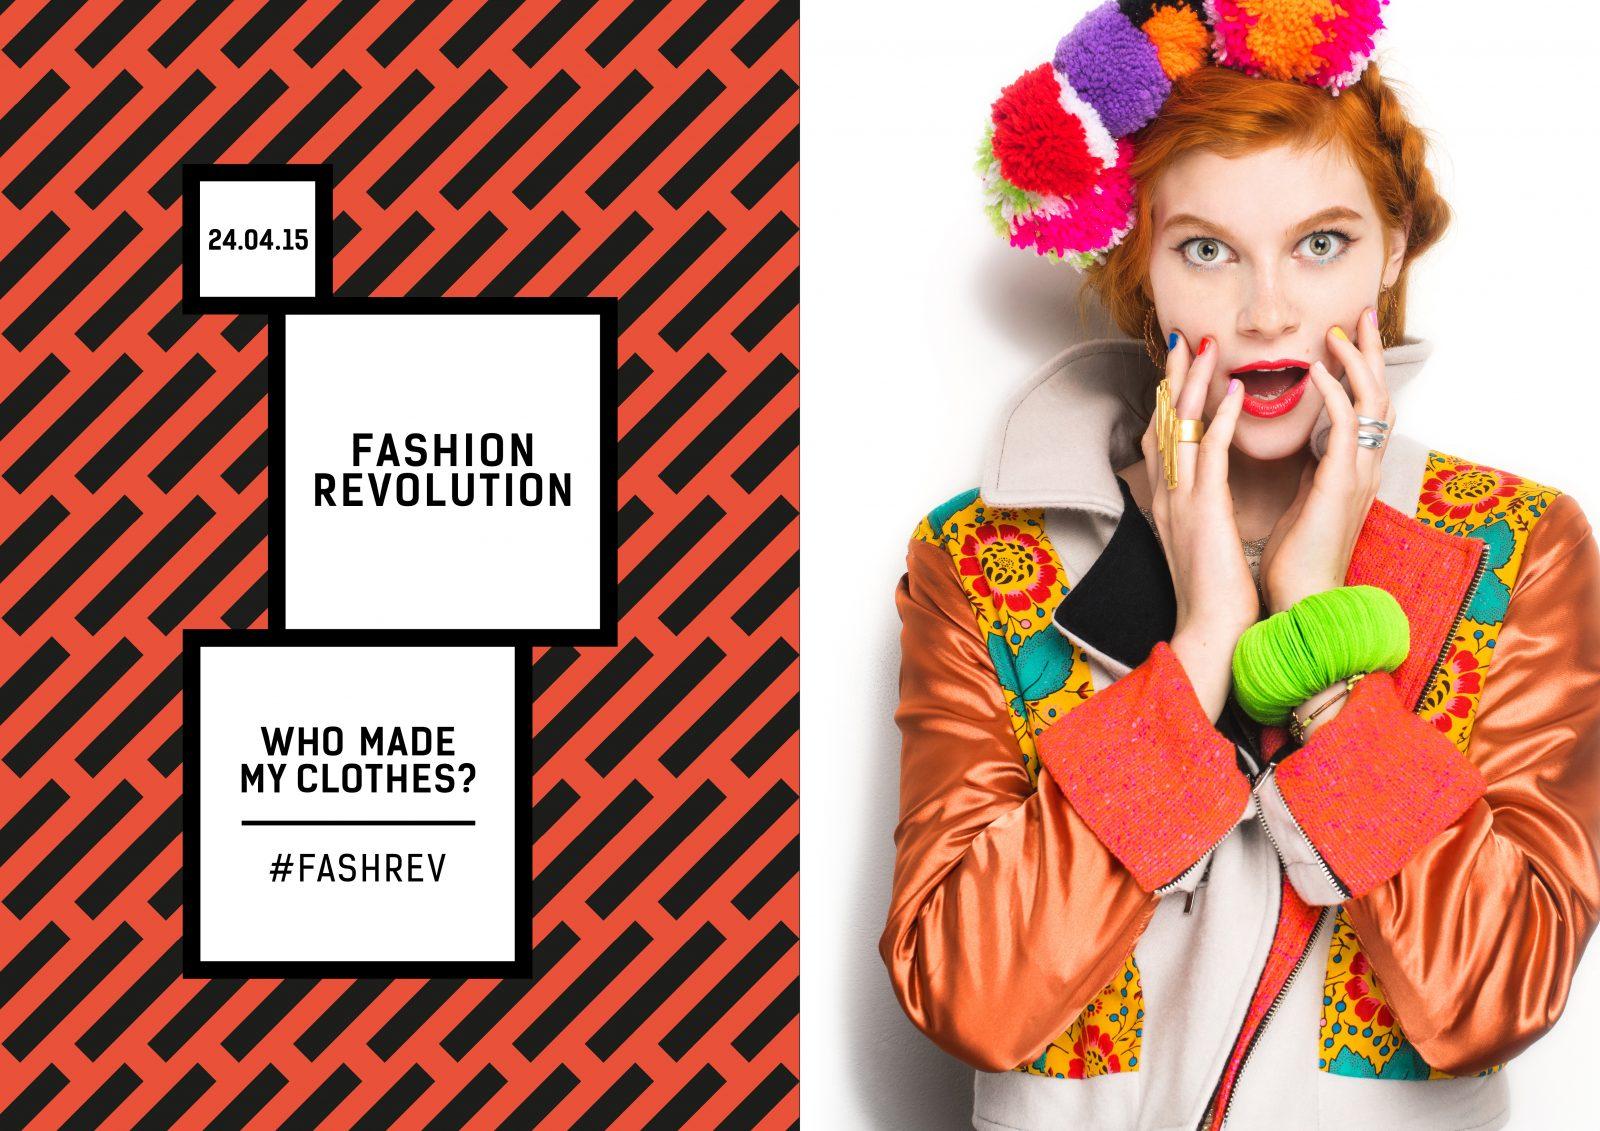 Fashion Revolution Day Poster 24 april 2013 Rana Plaza